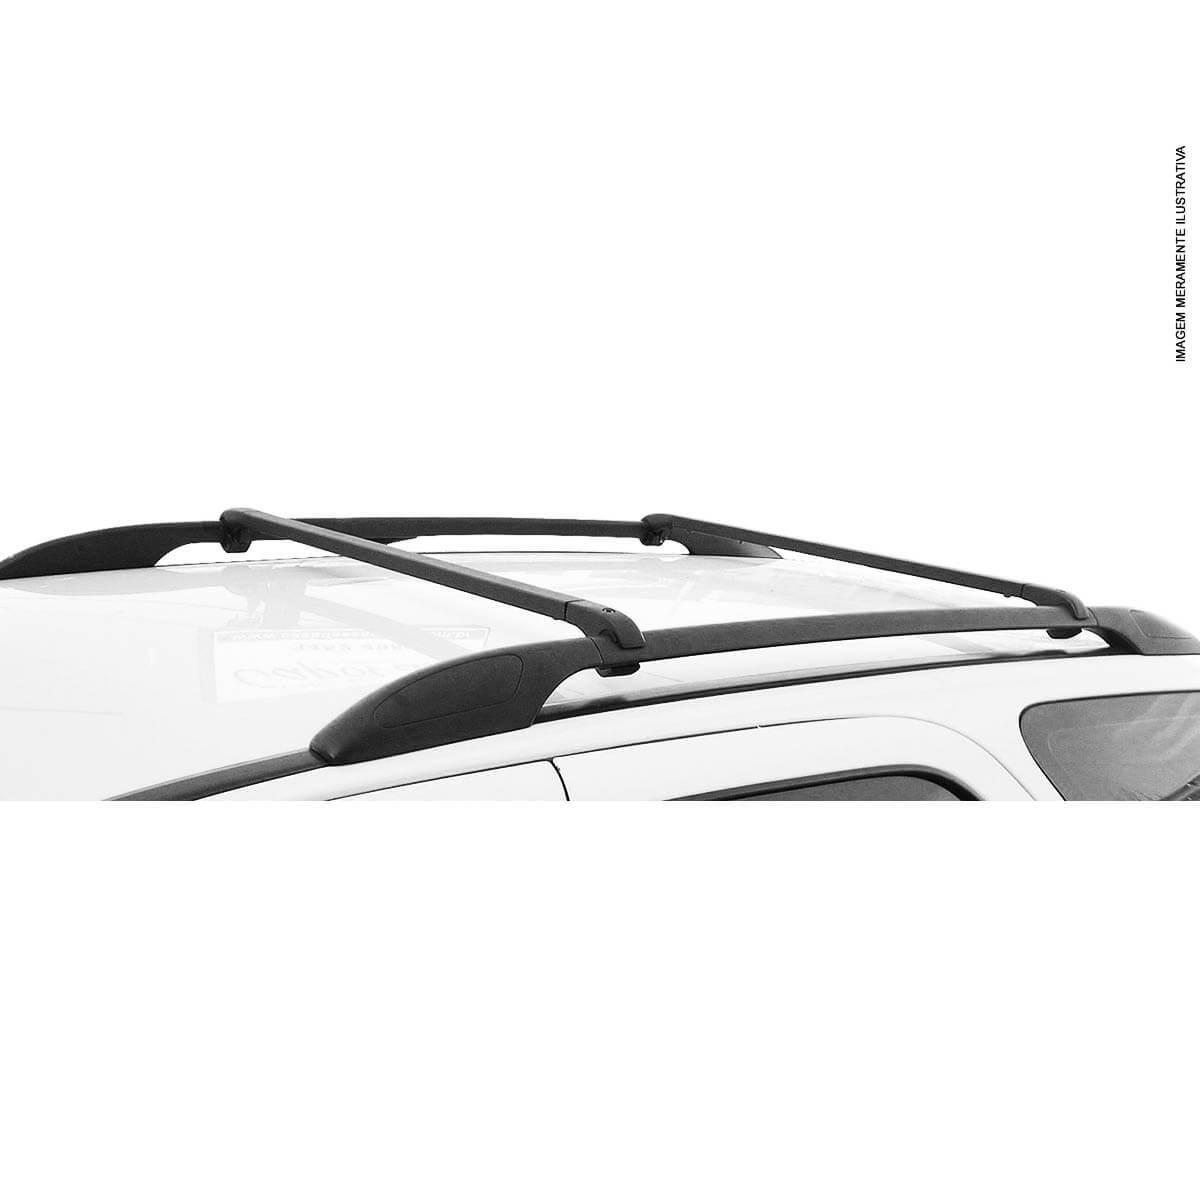 Travessa rack de teto alumínio preta UP! Cross VW up 2014 a 2018